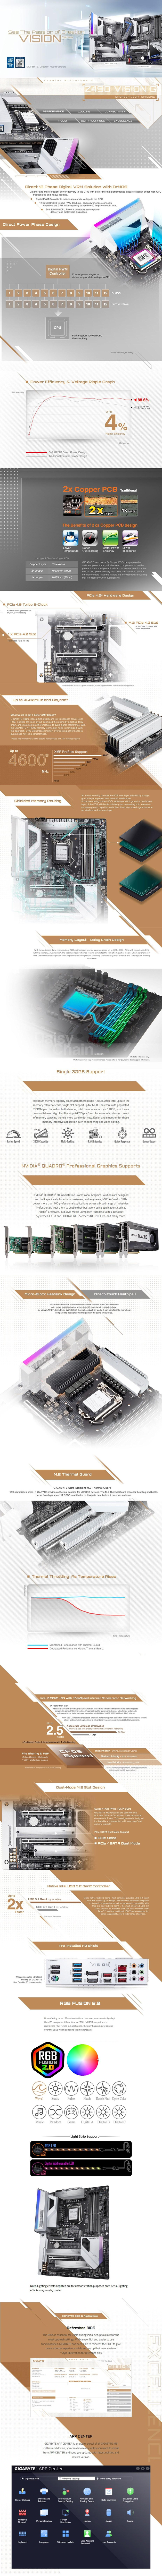 Gigabyte Z490 VISION G LGA 1200 ATX Motherboard - Overview 1